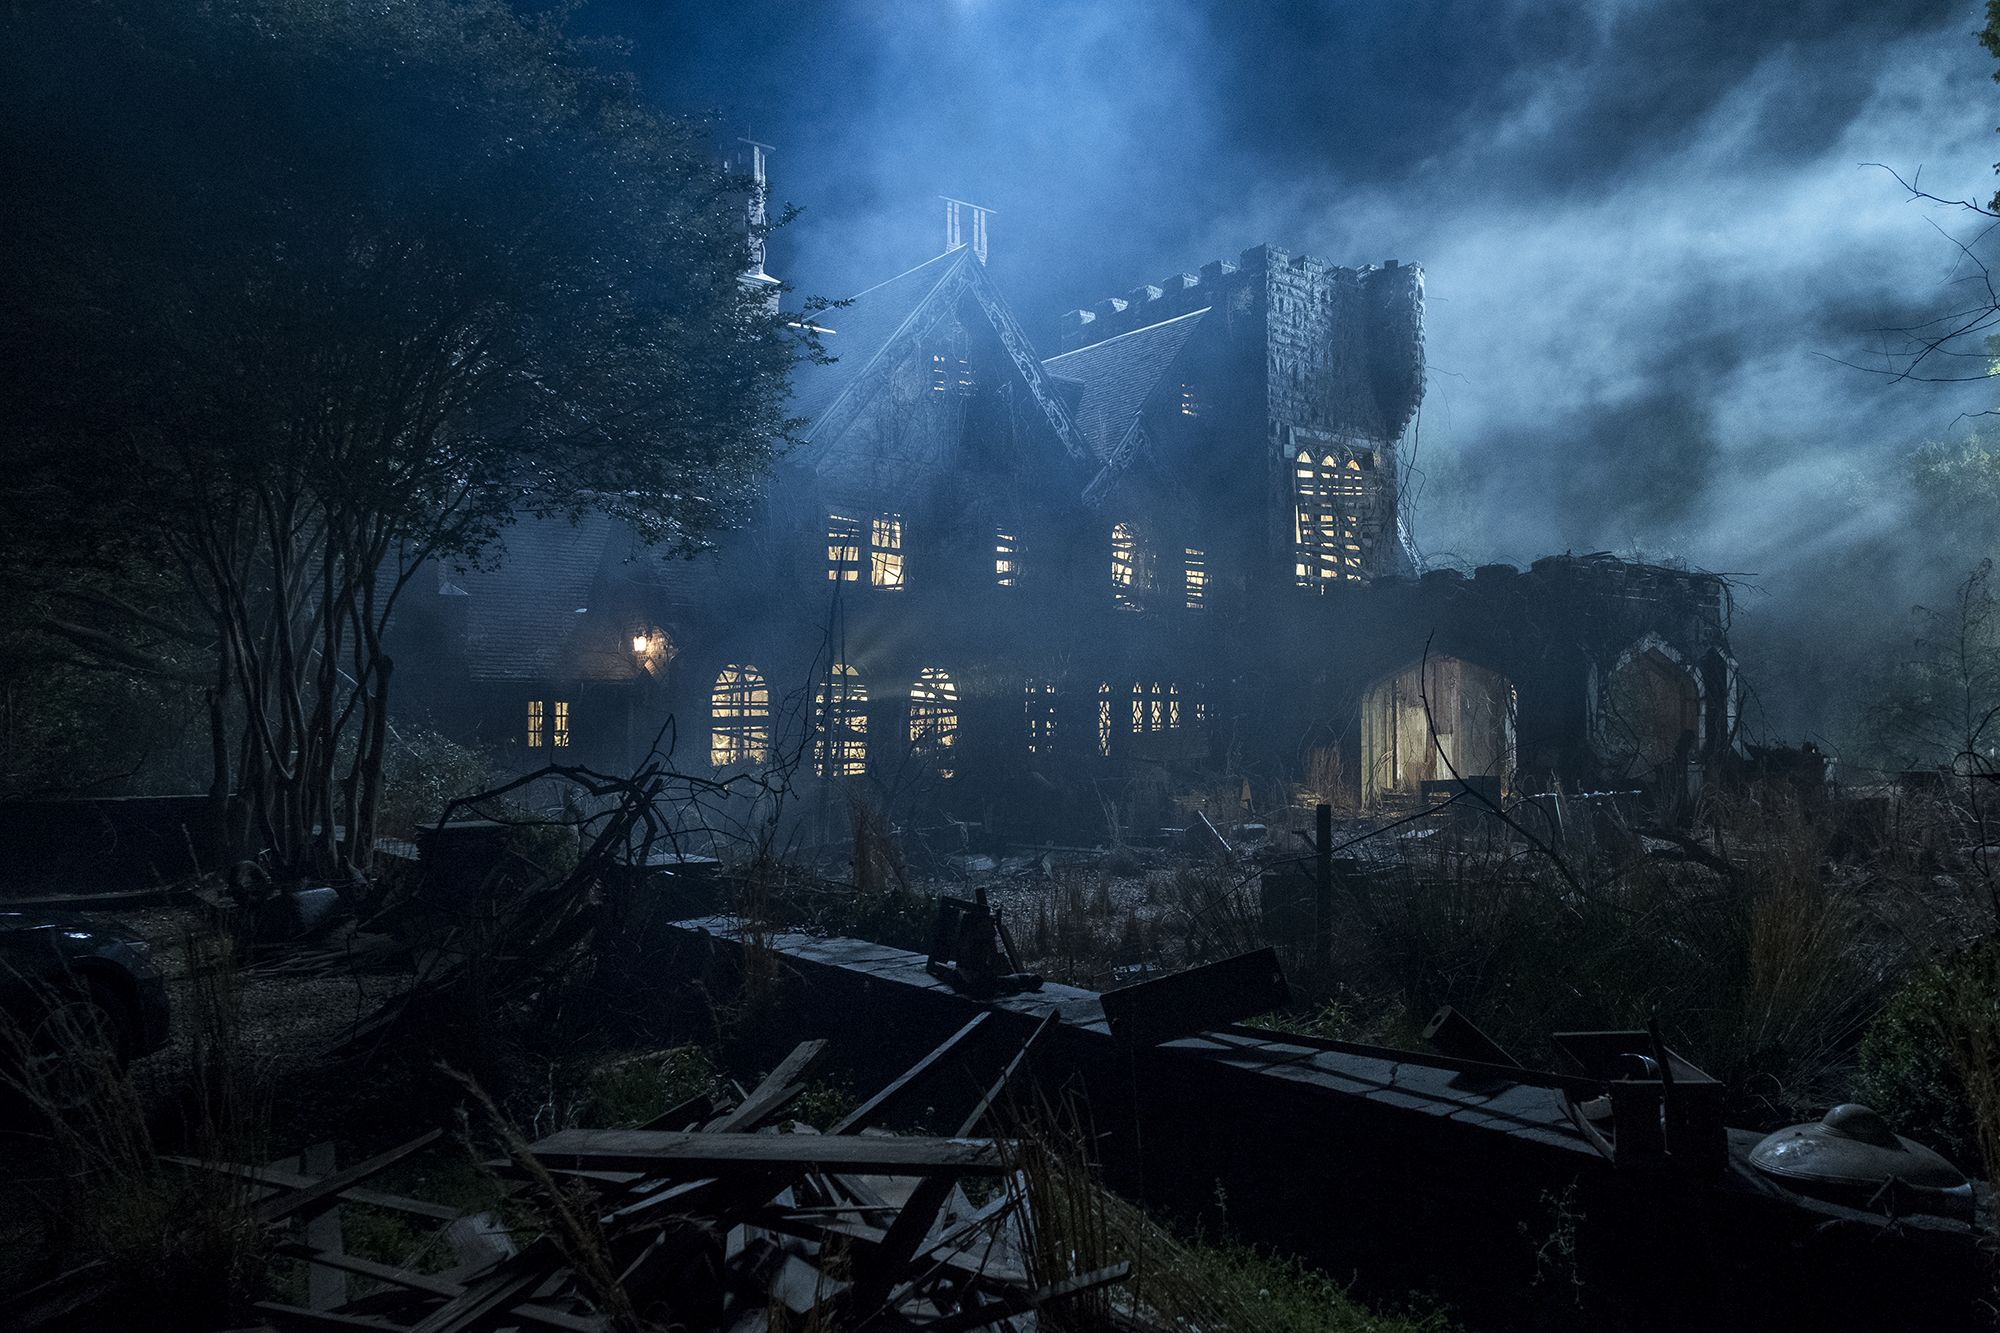 Netflix prepara una serie documental sobre casas encantadas